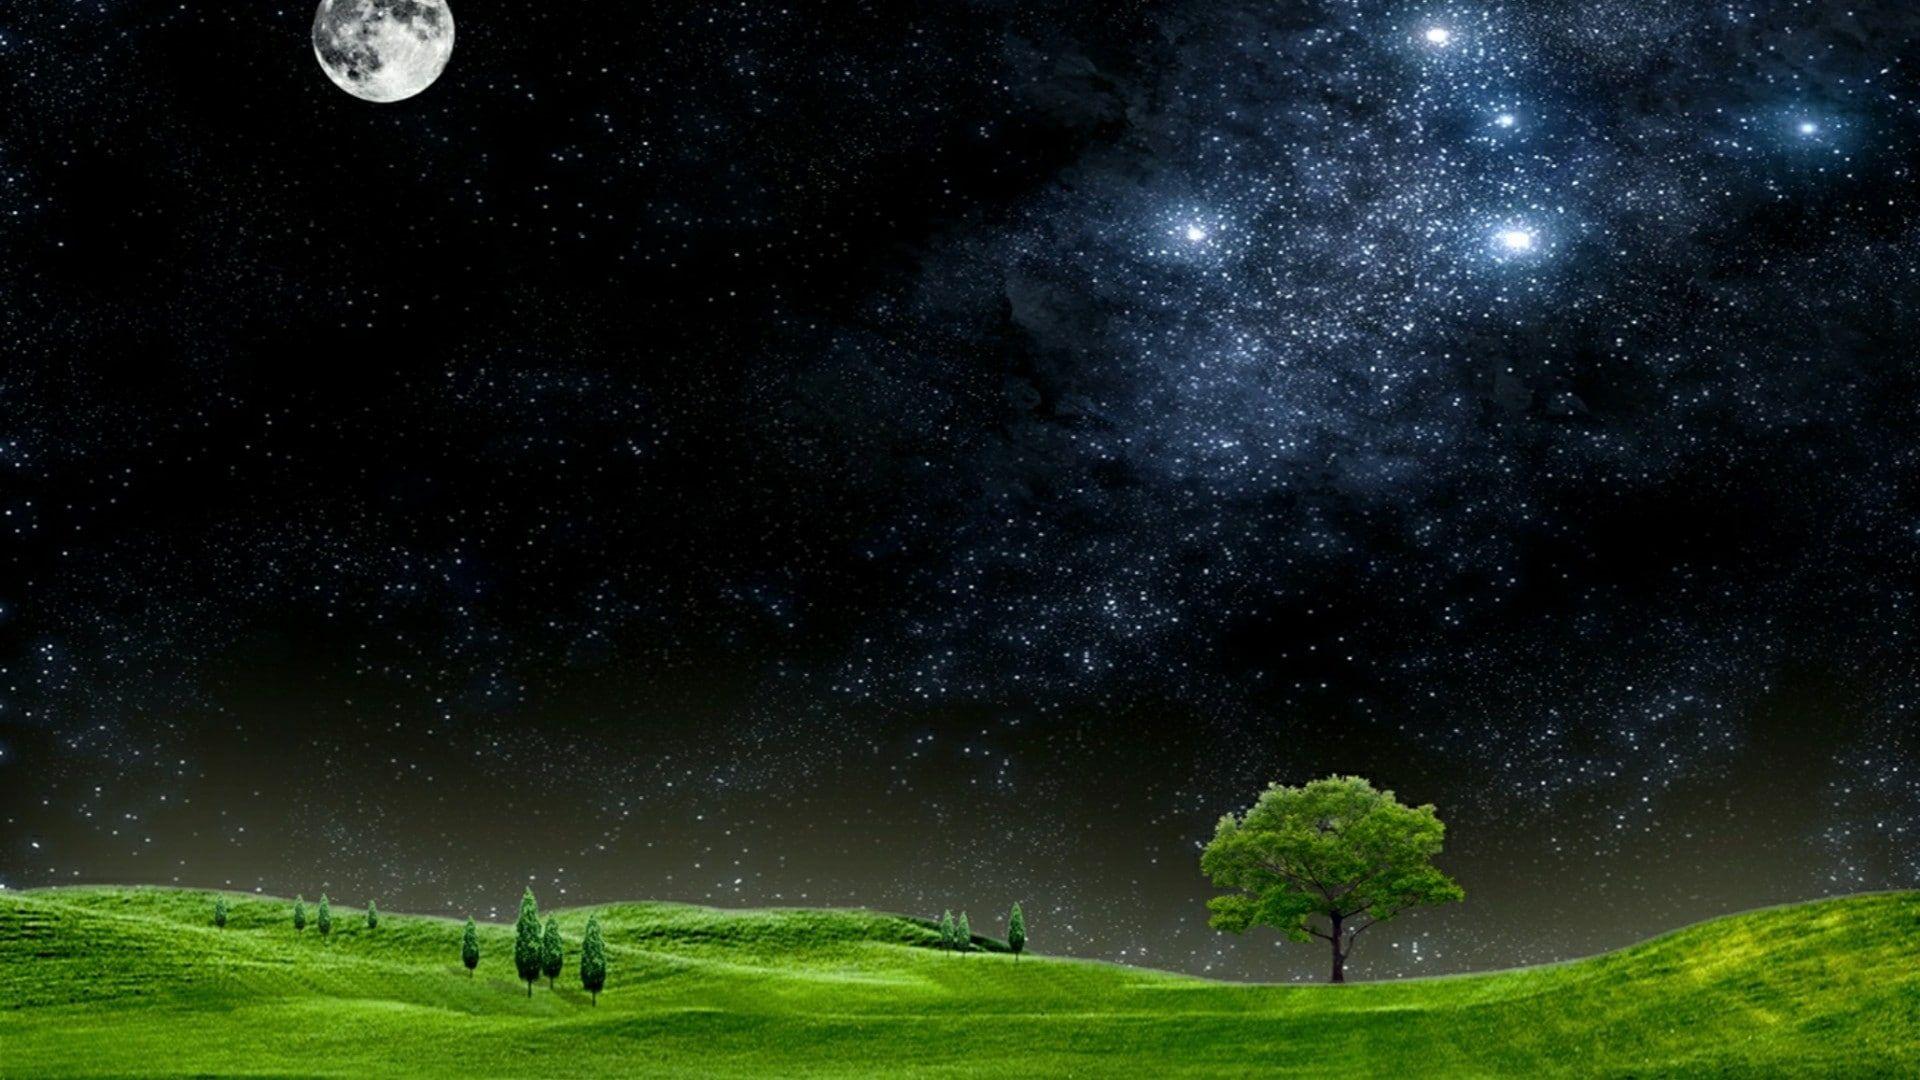 Nature Milky Way Stars Landscape Sky Mountains 1080p Wallpaper Hdwallpaper Desktop Scenic Photography Landscape Landscape Wallpaper